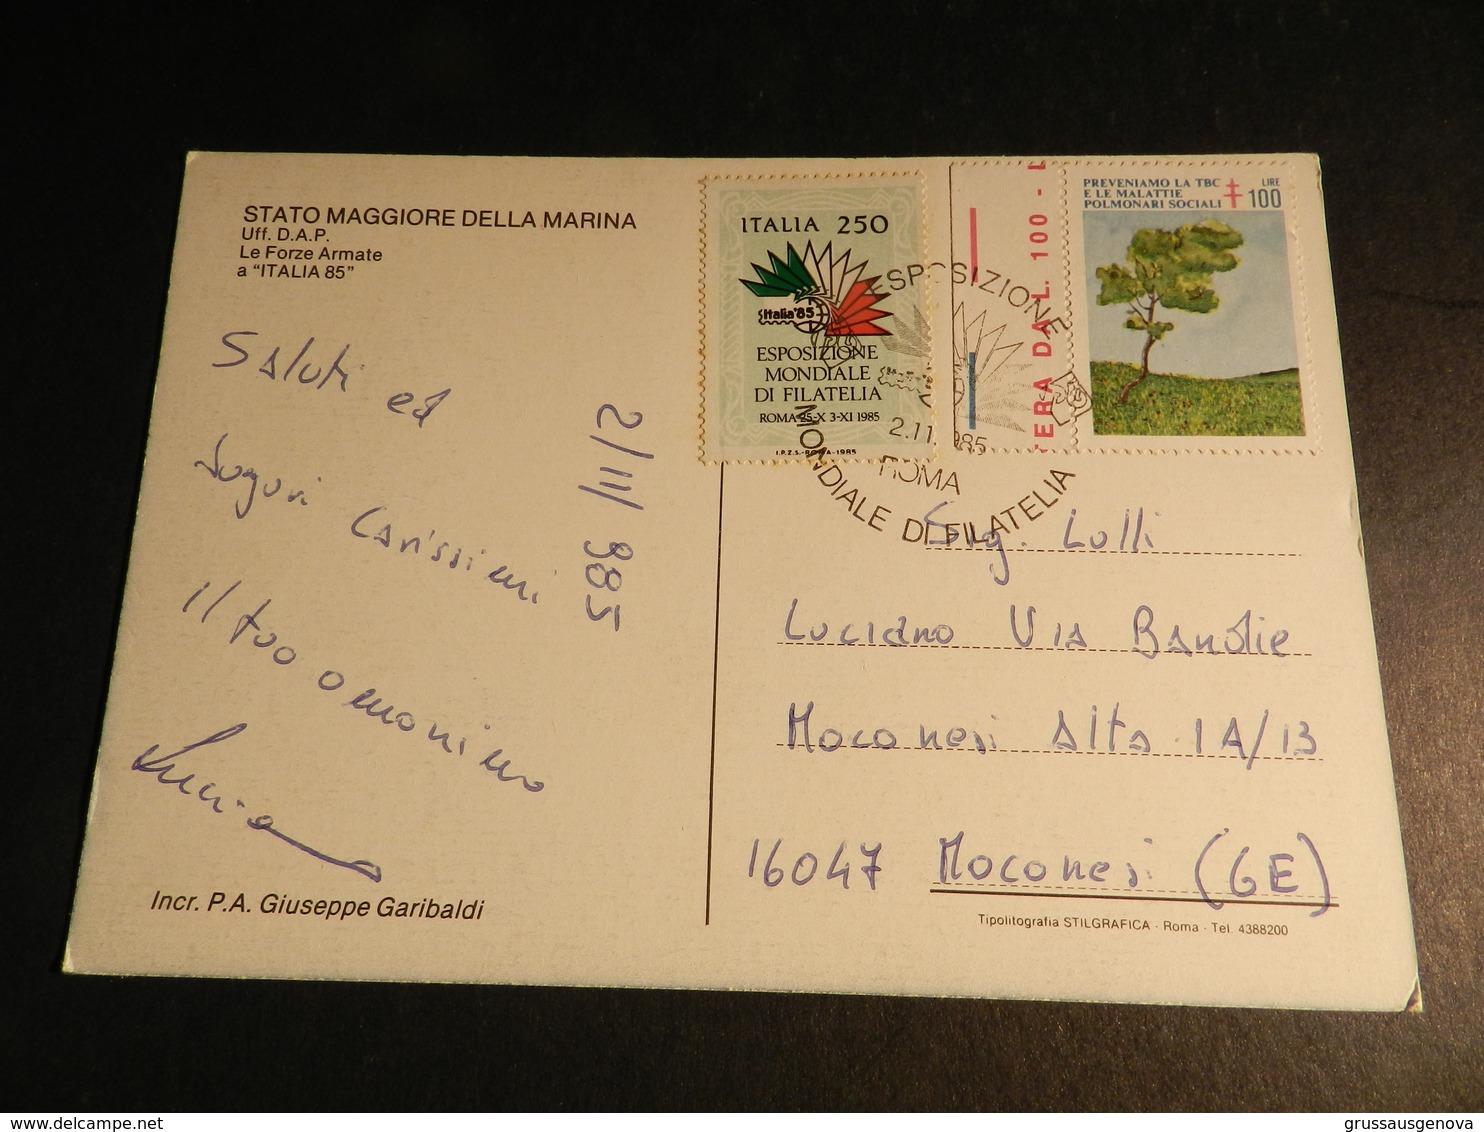 19942) NAVE PORTAEREI GIUSEPPE GARIBALDI ITALIA 85 VIAGGIATA CON ERINNOFILO - Guerra